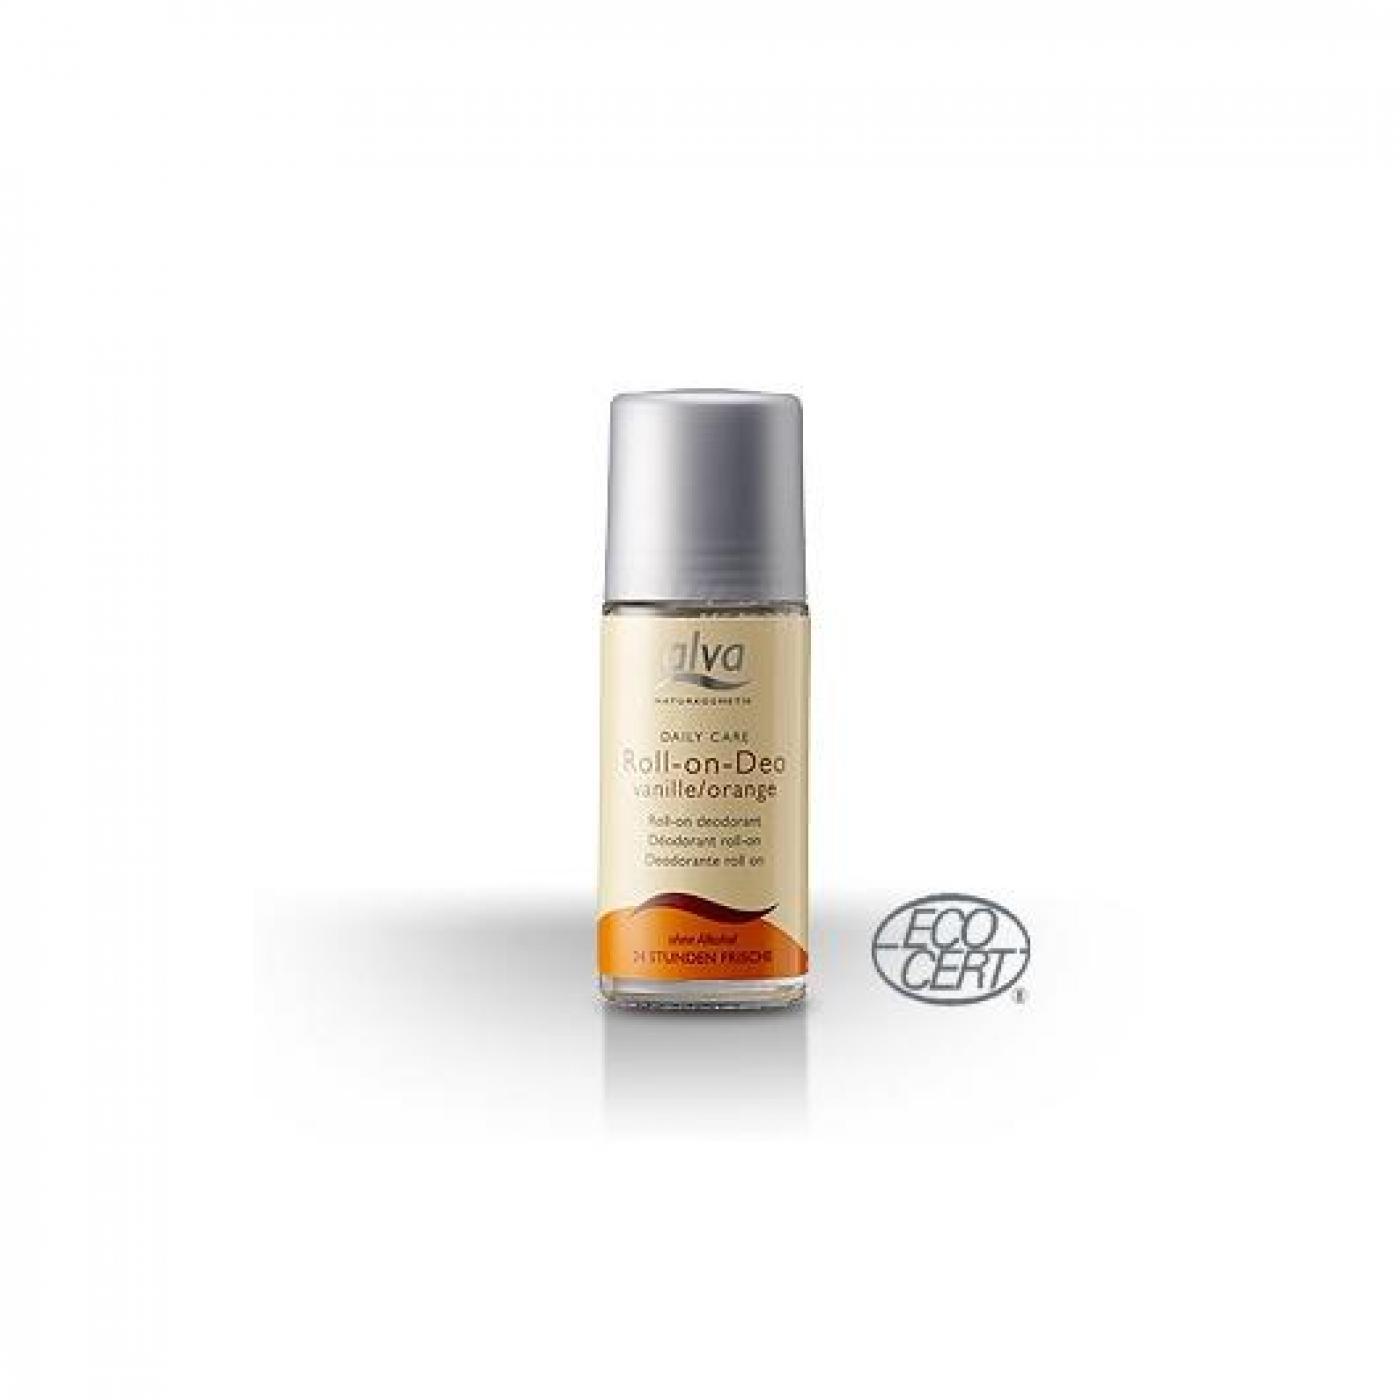 Desodorante Roll On de vainilla y naranja Alva, 50ml